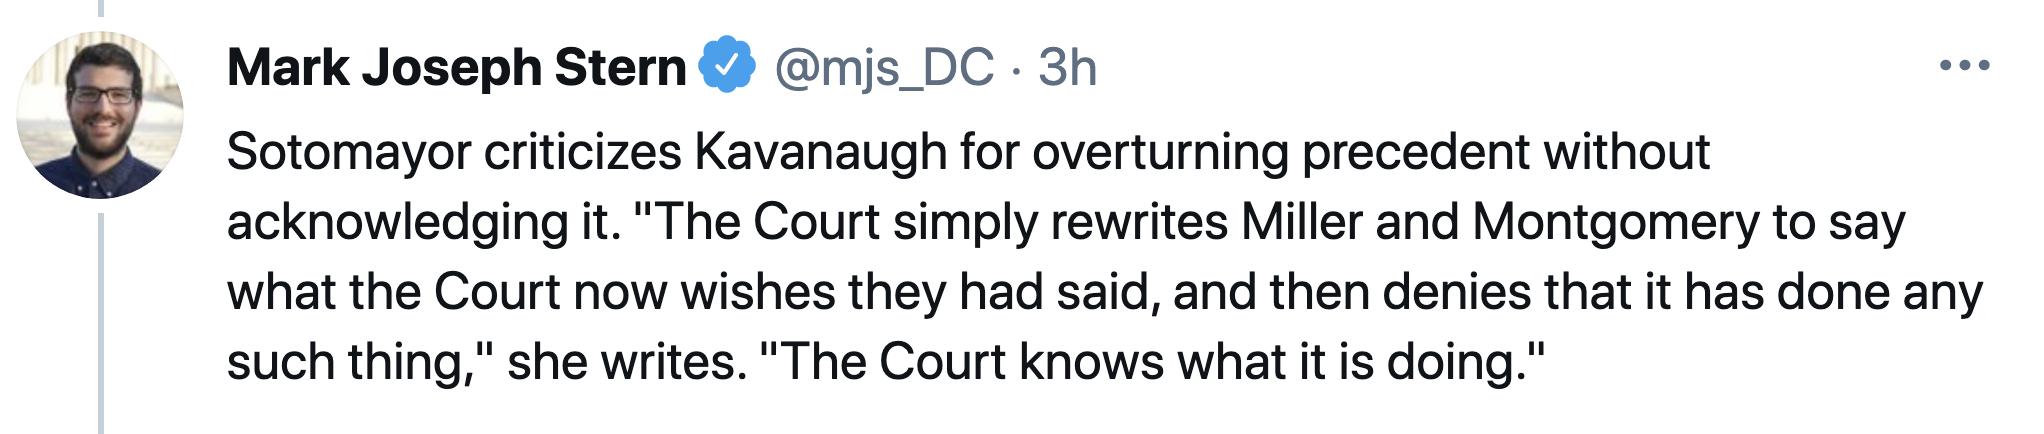 Screen-Shot-2021-04-22-at-1.01.29-PM Sonia Sotomayor Steamrolls Over Brett Kavanaugh In Thursday Rebuke Child Abuse Featured Politics Supreme Court Top Stories